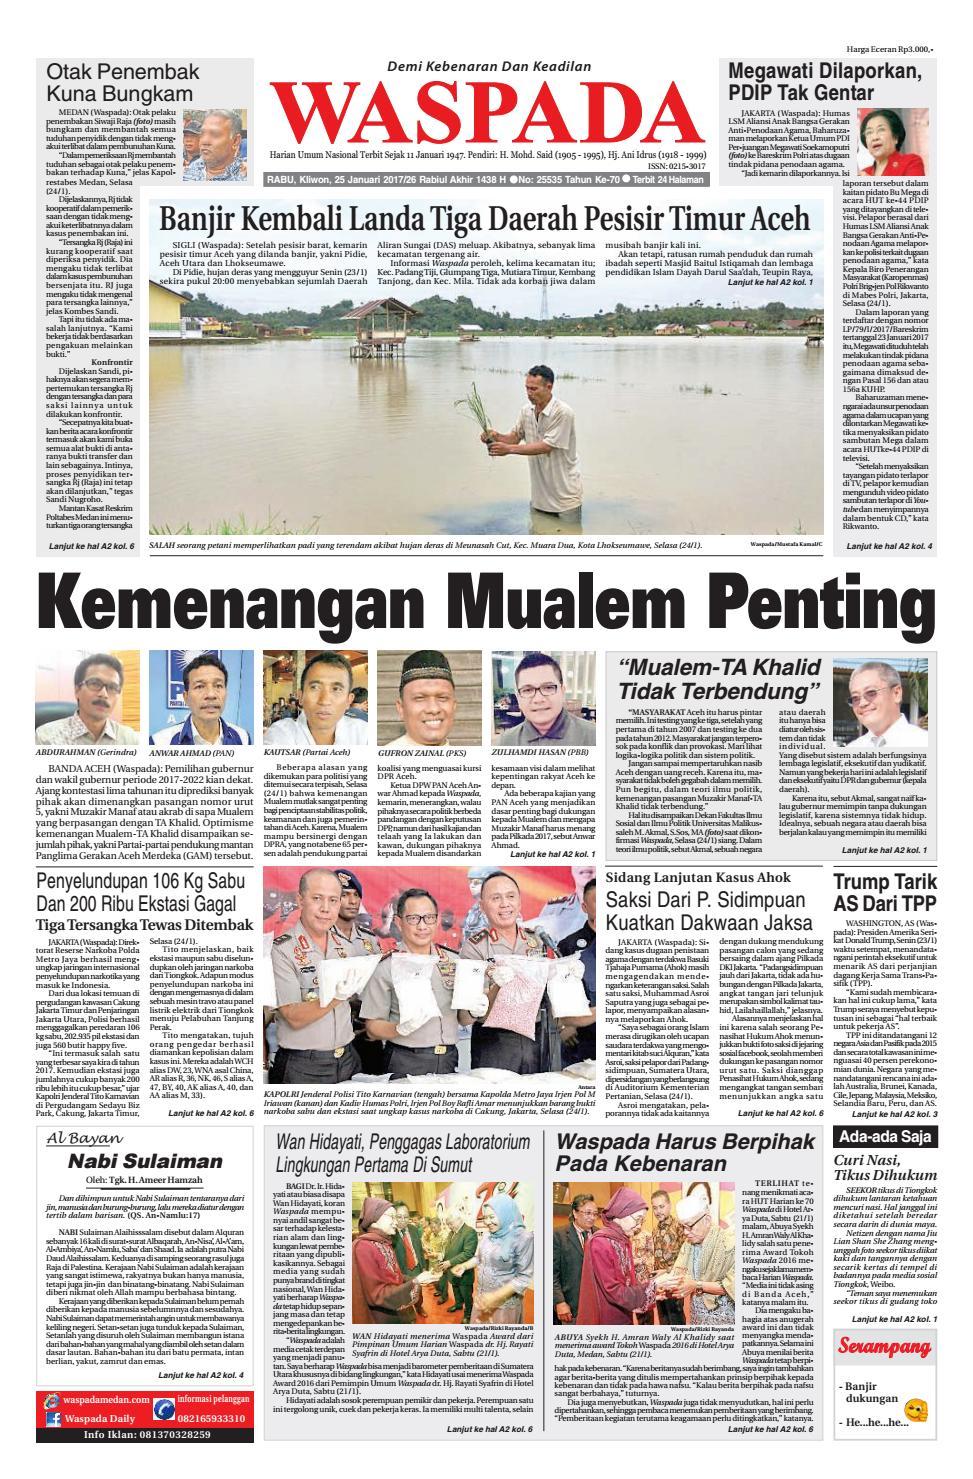 Waspada Rabu 25 Januari 2017 By Harian Issuu Produk Ukm Bumn Tas Ransel Threepoint